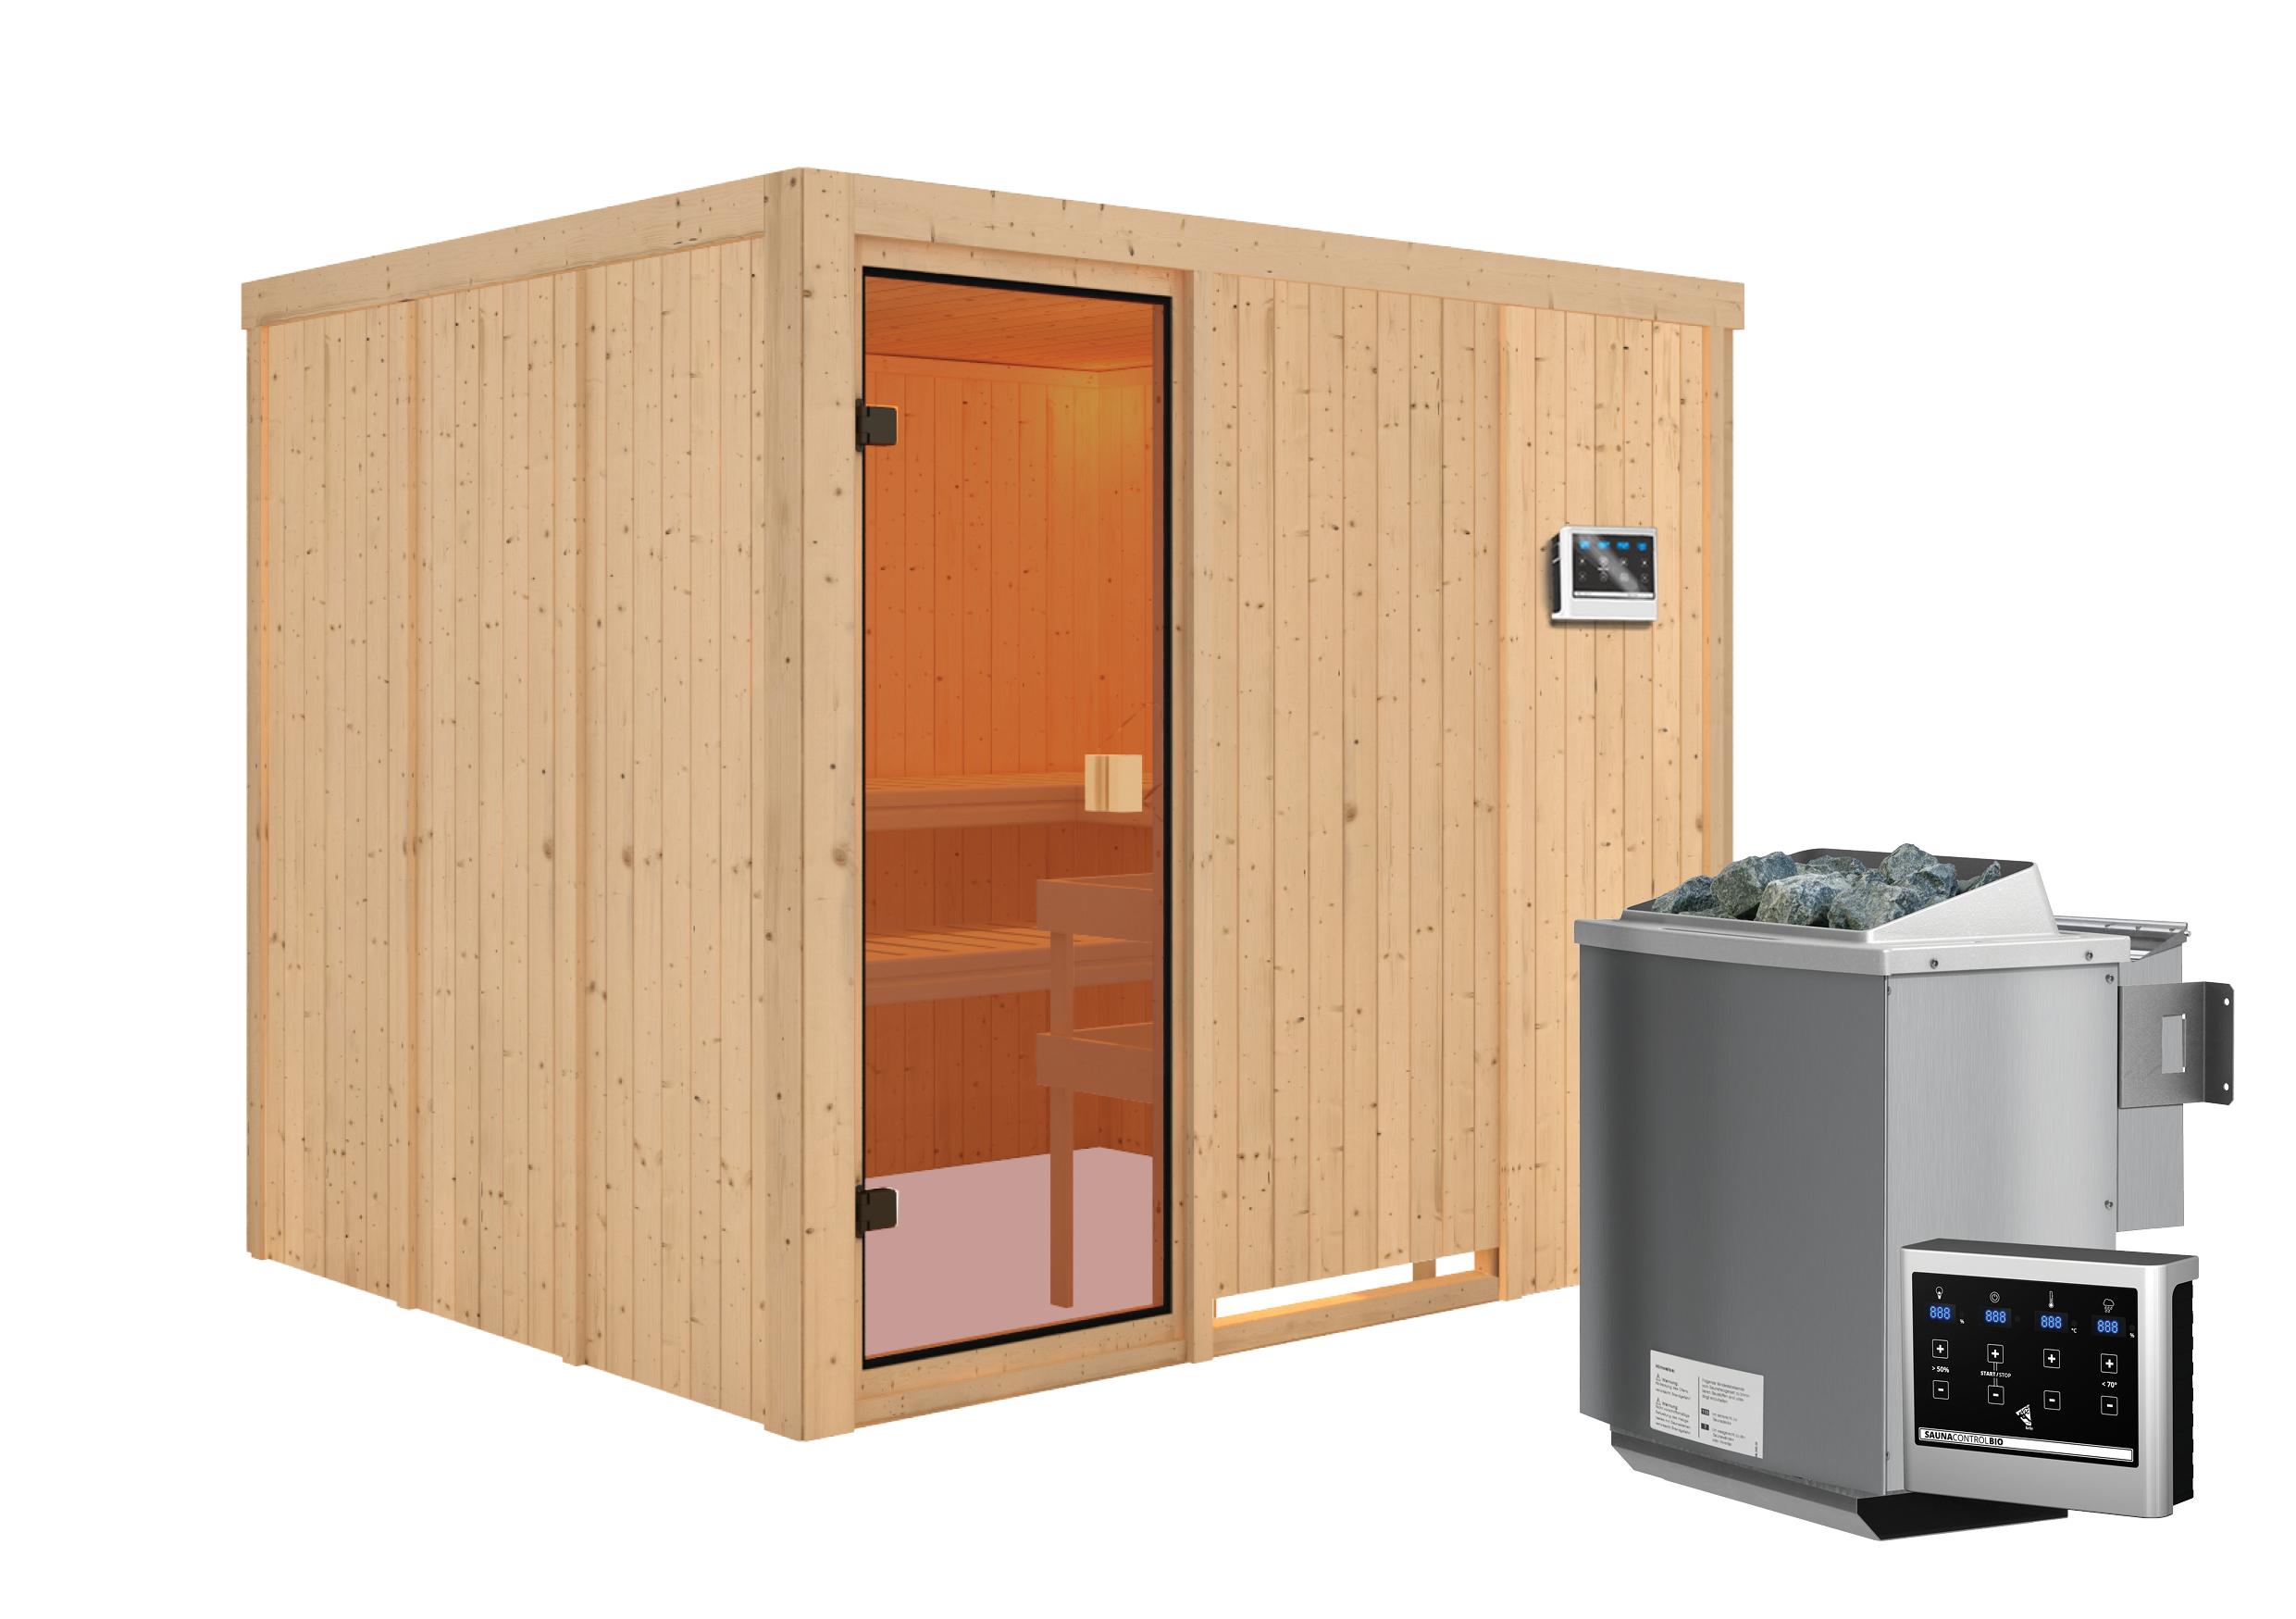 Woodfeeling Sauna Nybro 68mm Bio Saunaofen 9kW extern Bild 9